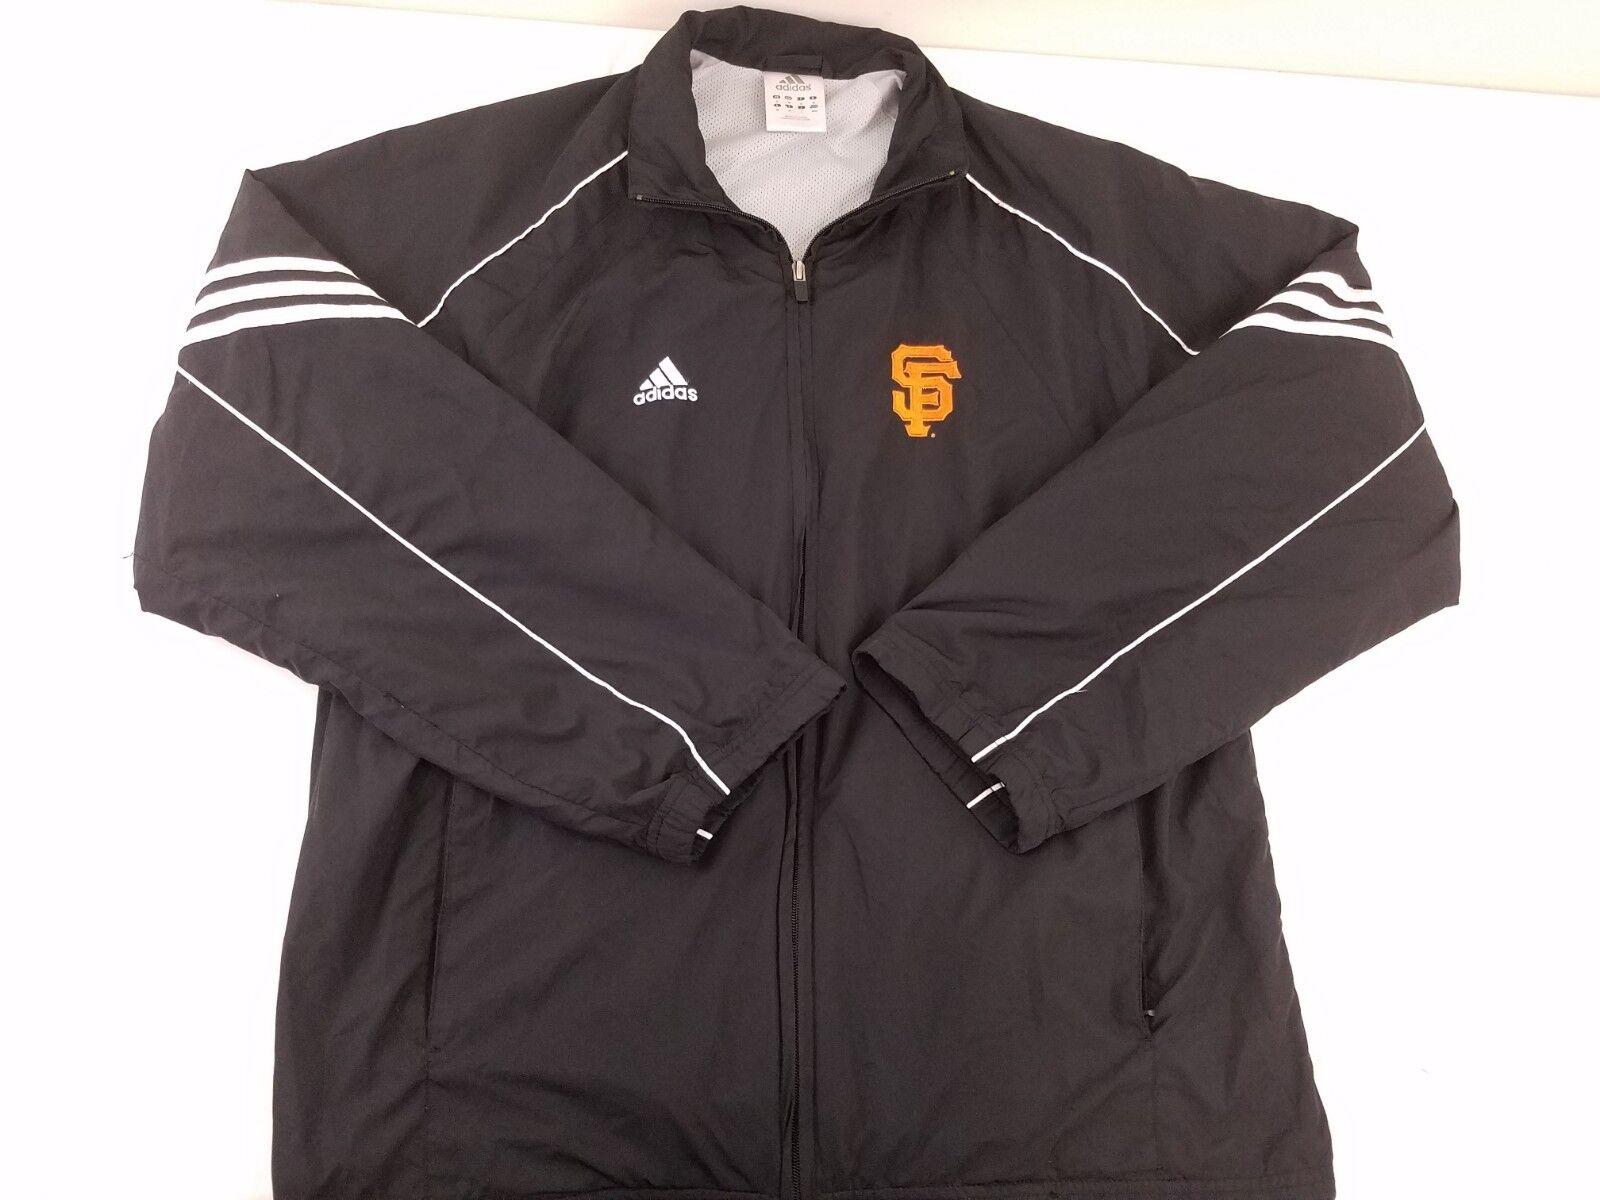 Veste Coupe-Vent Full Zip Adidas Hommes Noir San Francisco Giants Taille Medium